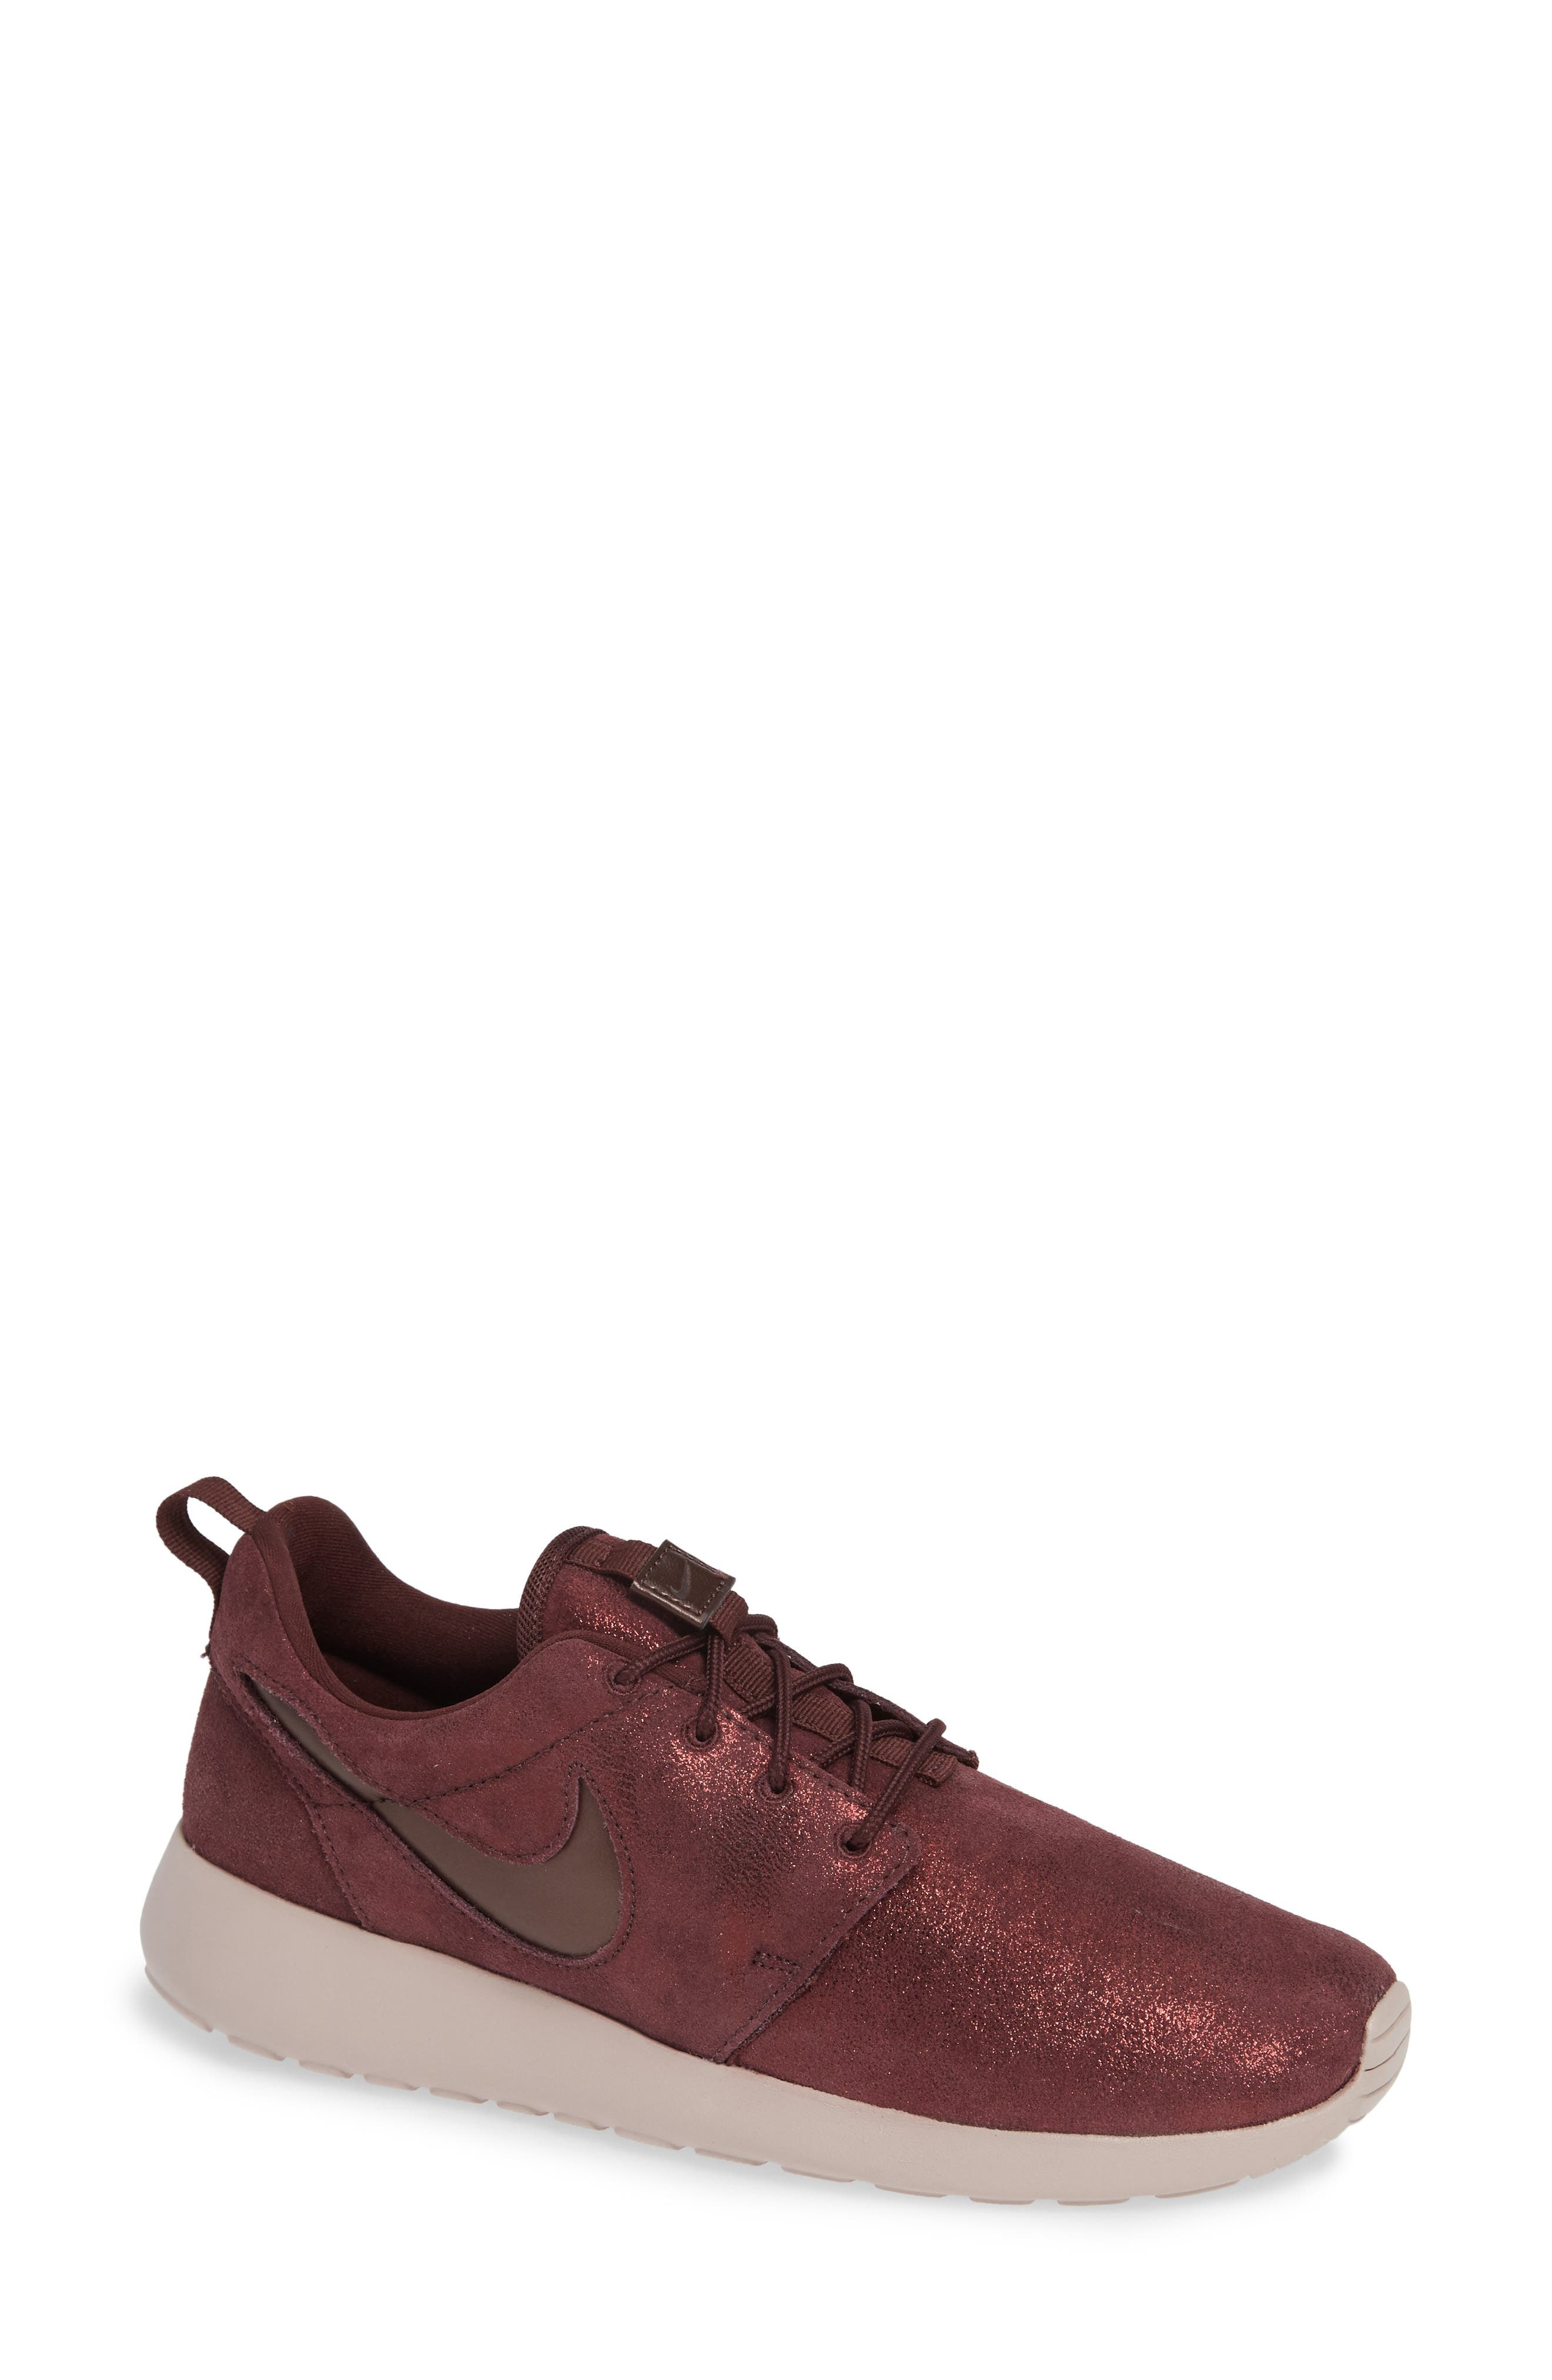 'Roshe Run' Print Sneaker,                             Main thumbnail 1, color,                             METALLIC MAHOGANY/ MAHOGANY